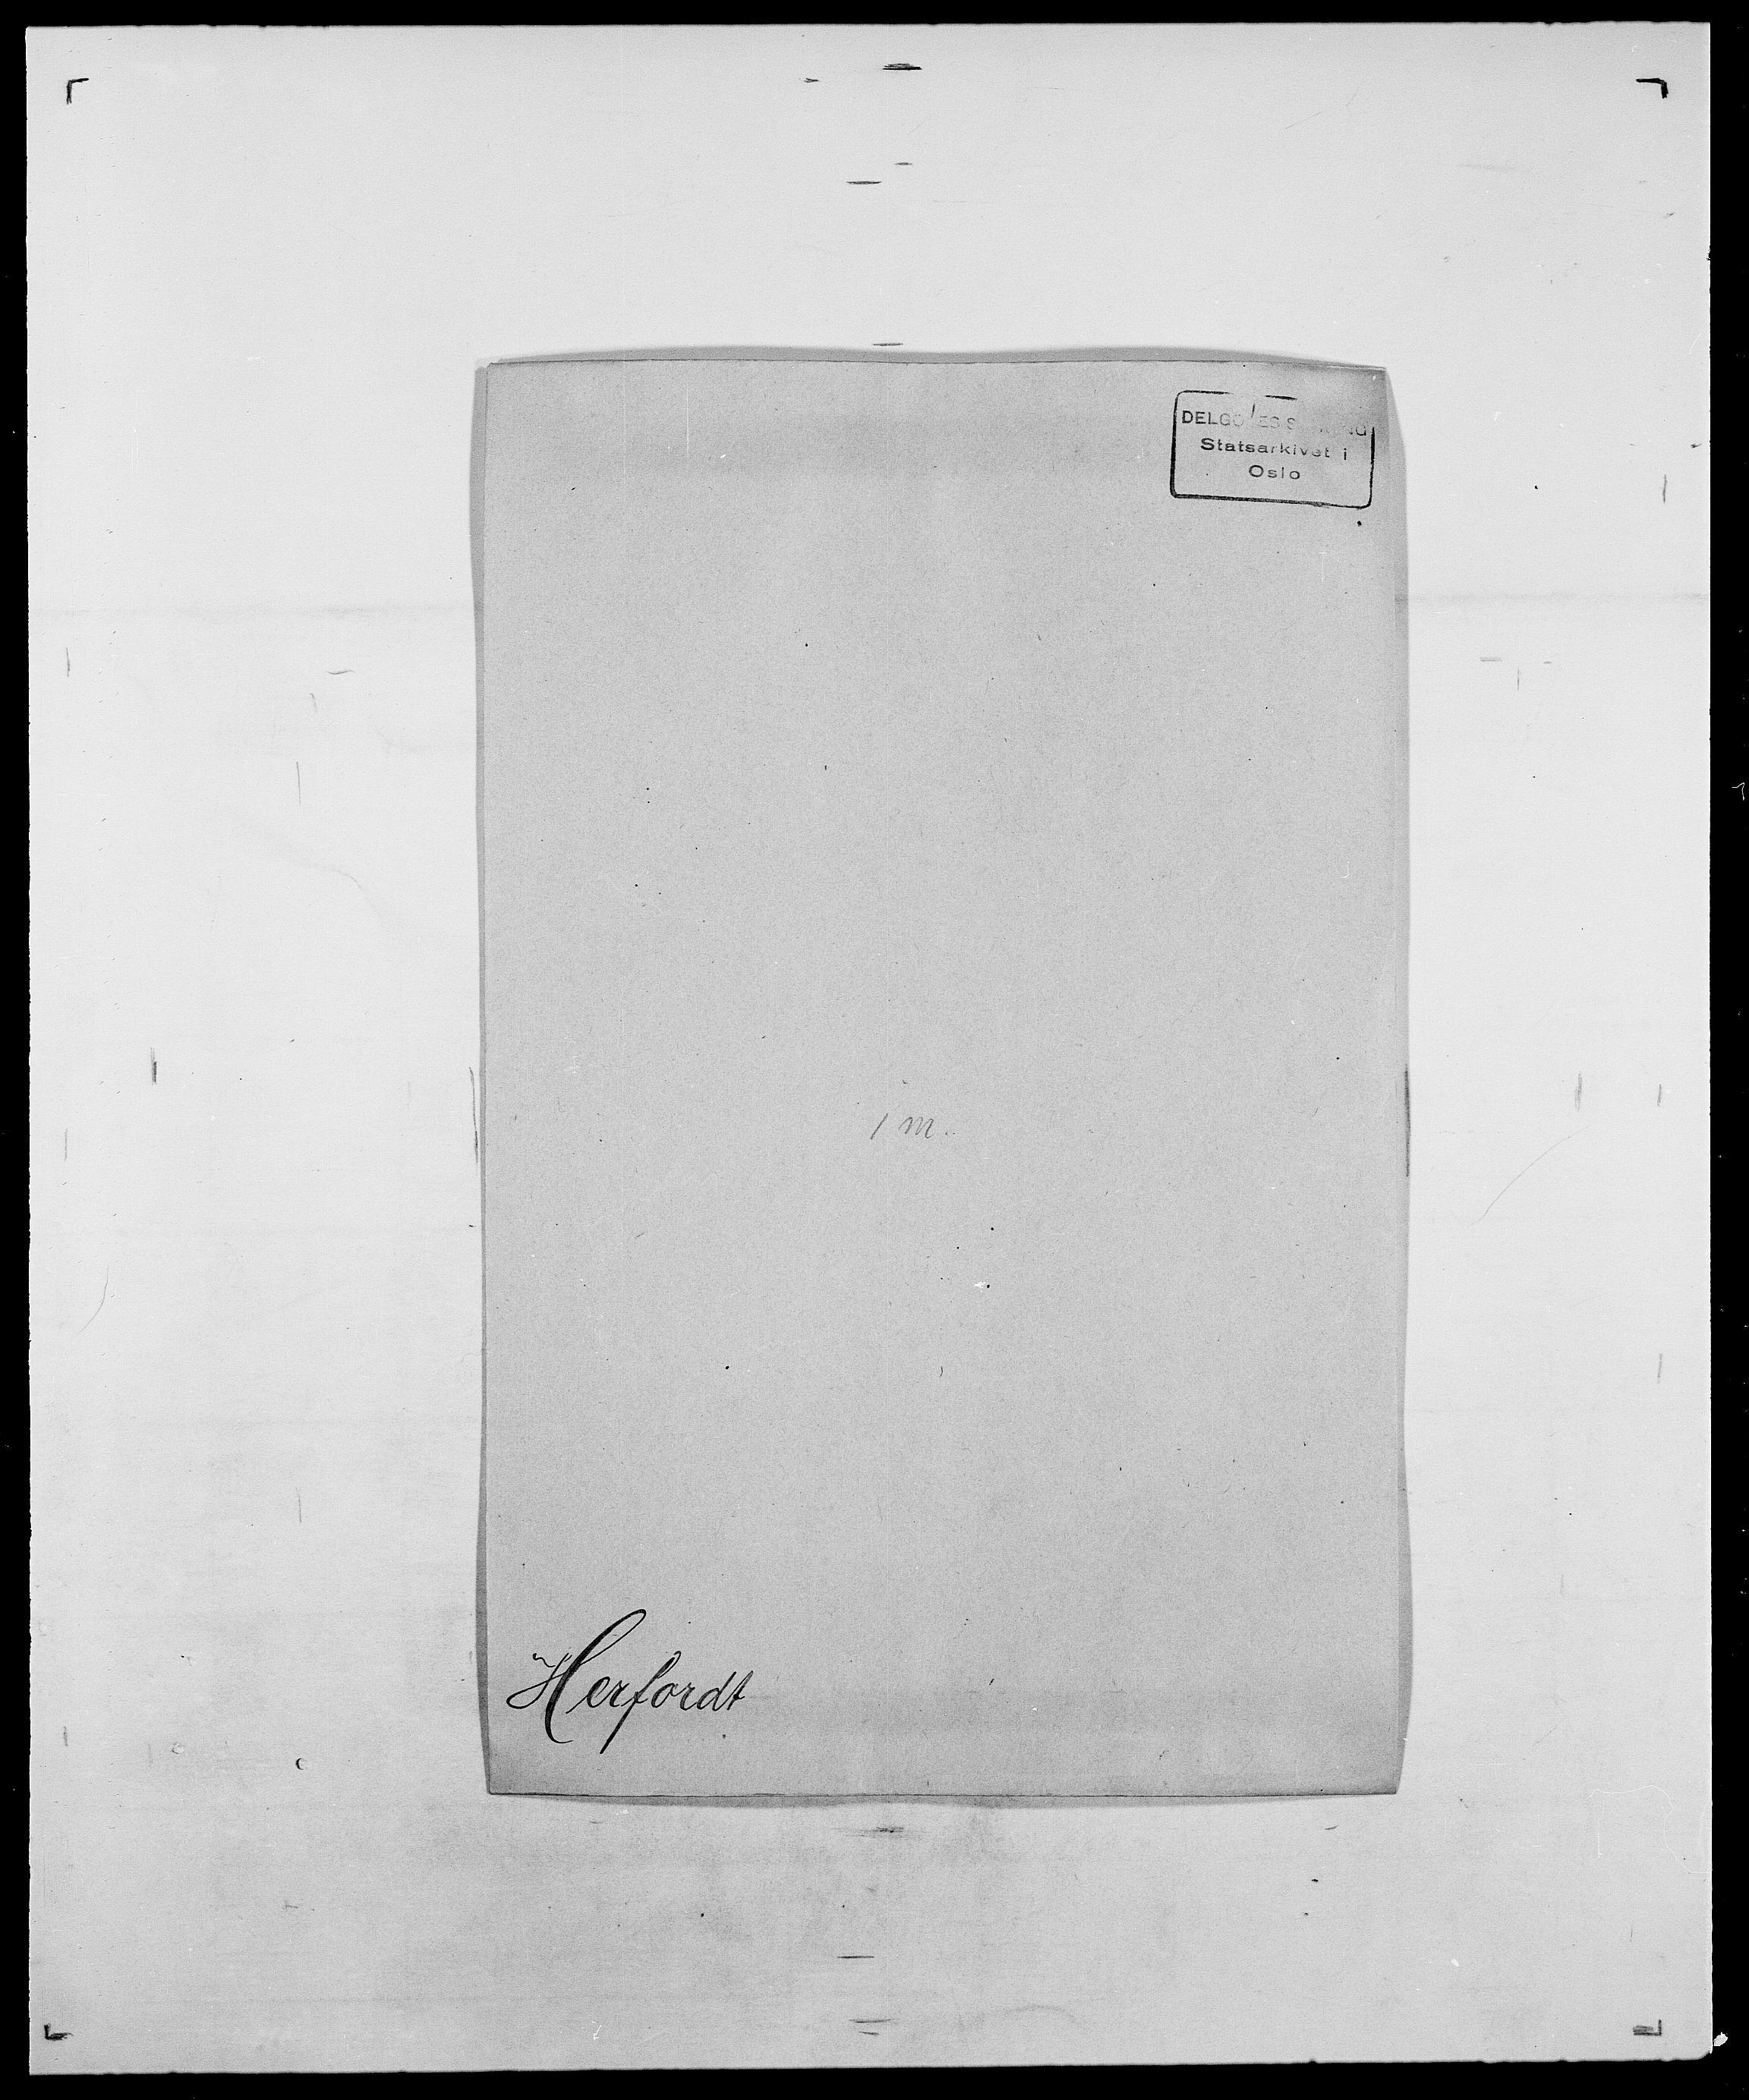 SAO, Delgobe, Charles Antoine - samling, D/Da/L0017: Helander - Hjørne, s. 232